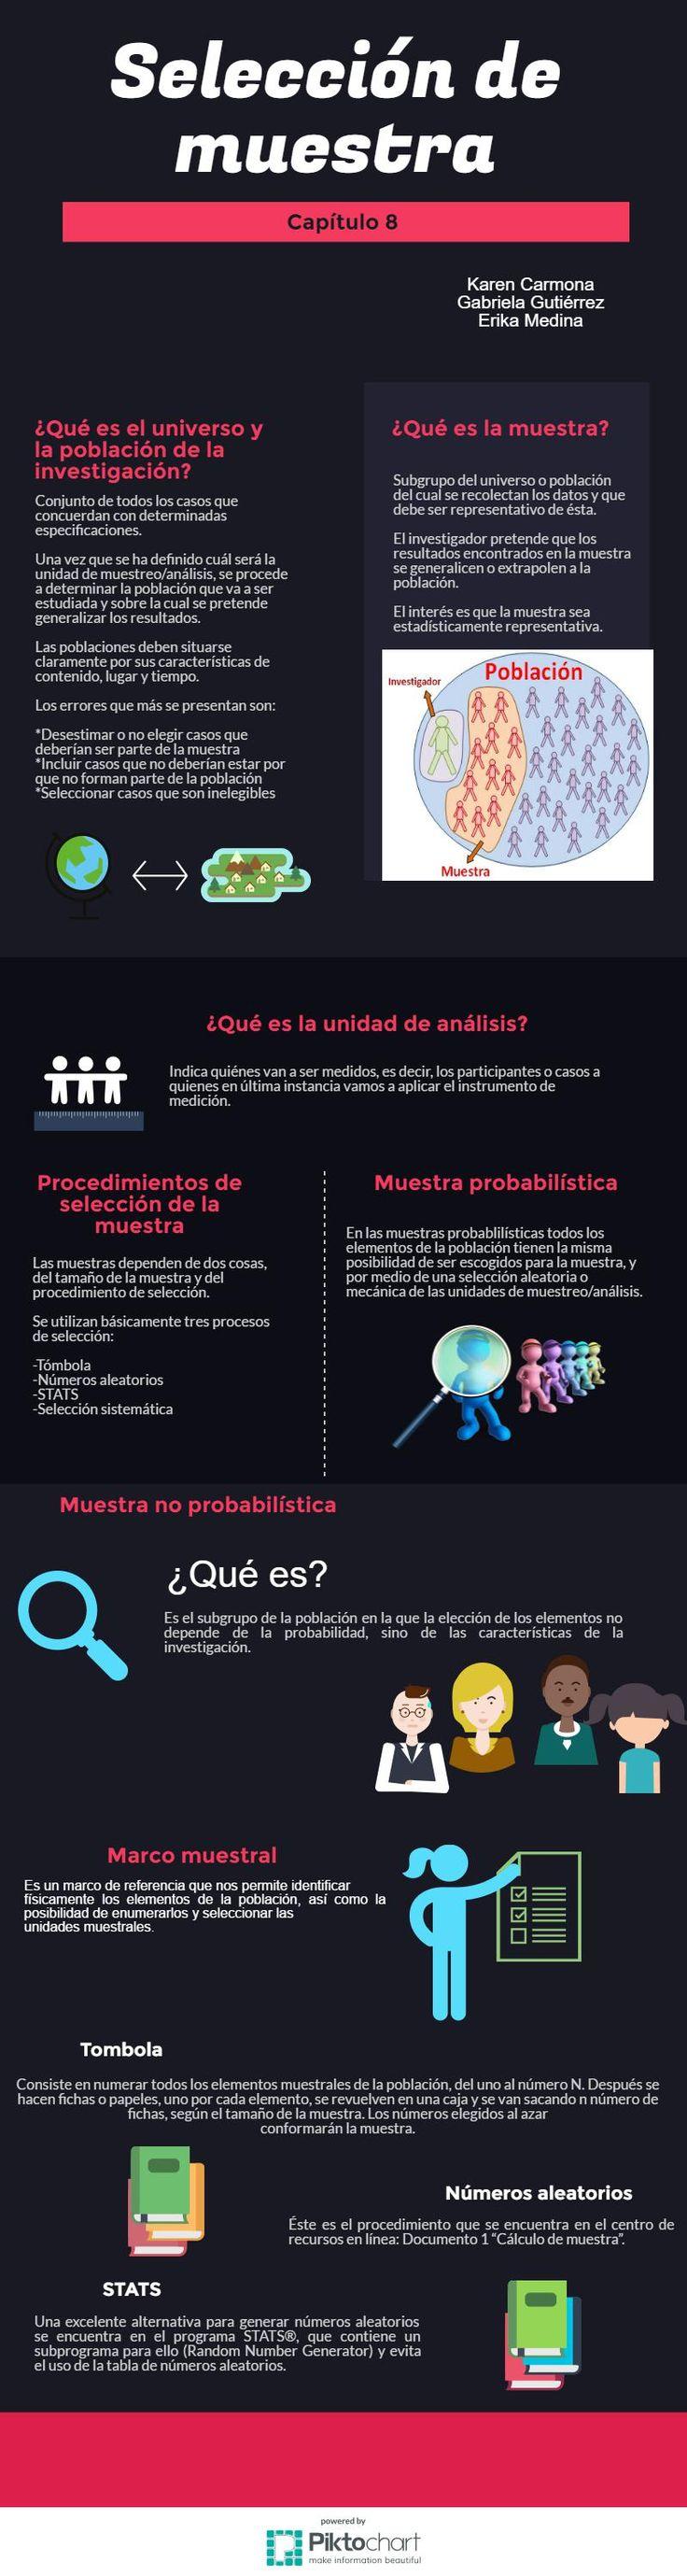 35 best Investigación images on Pinterest | La investigacion ...